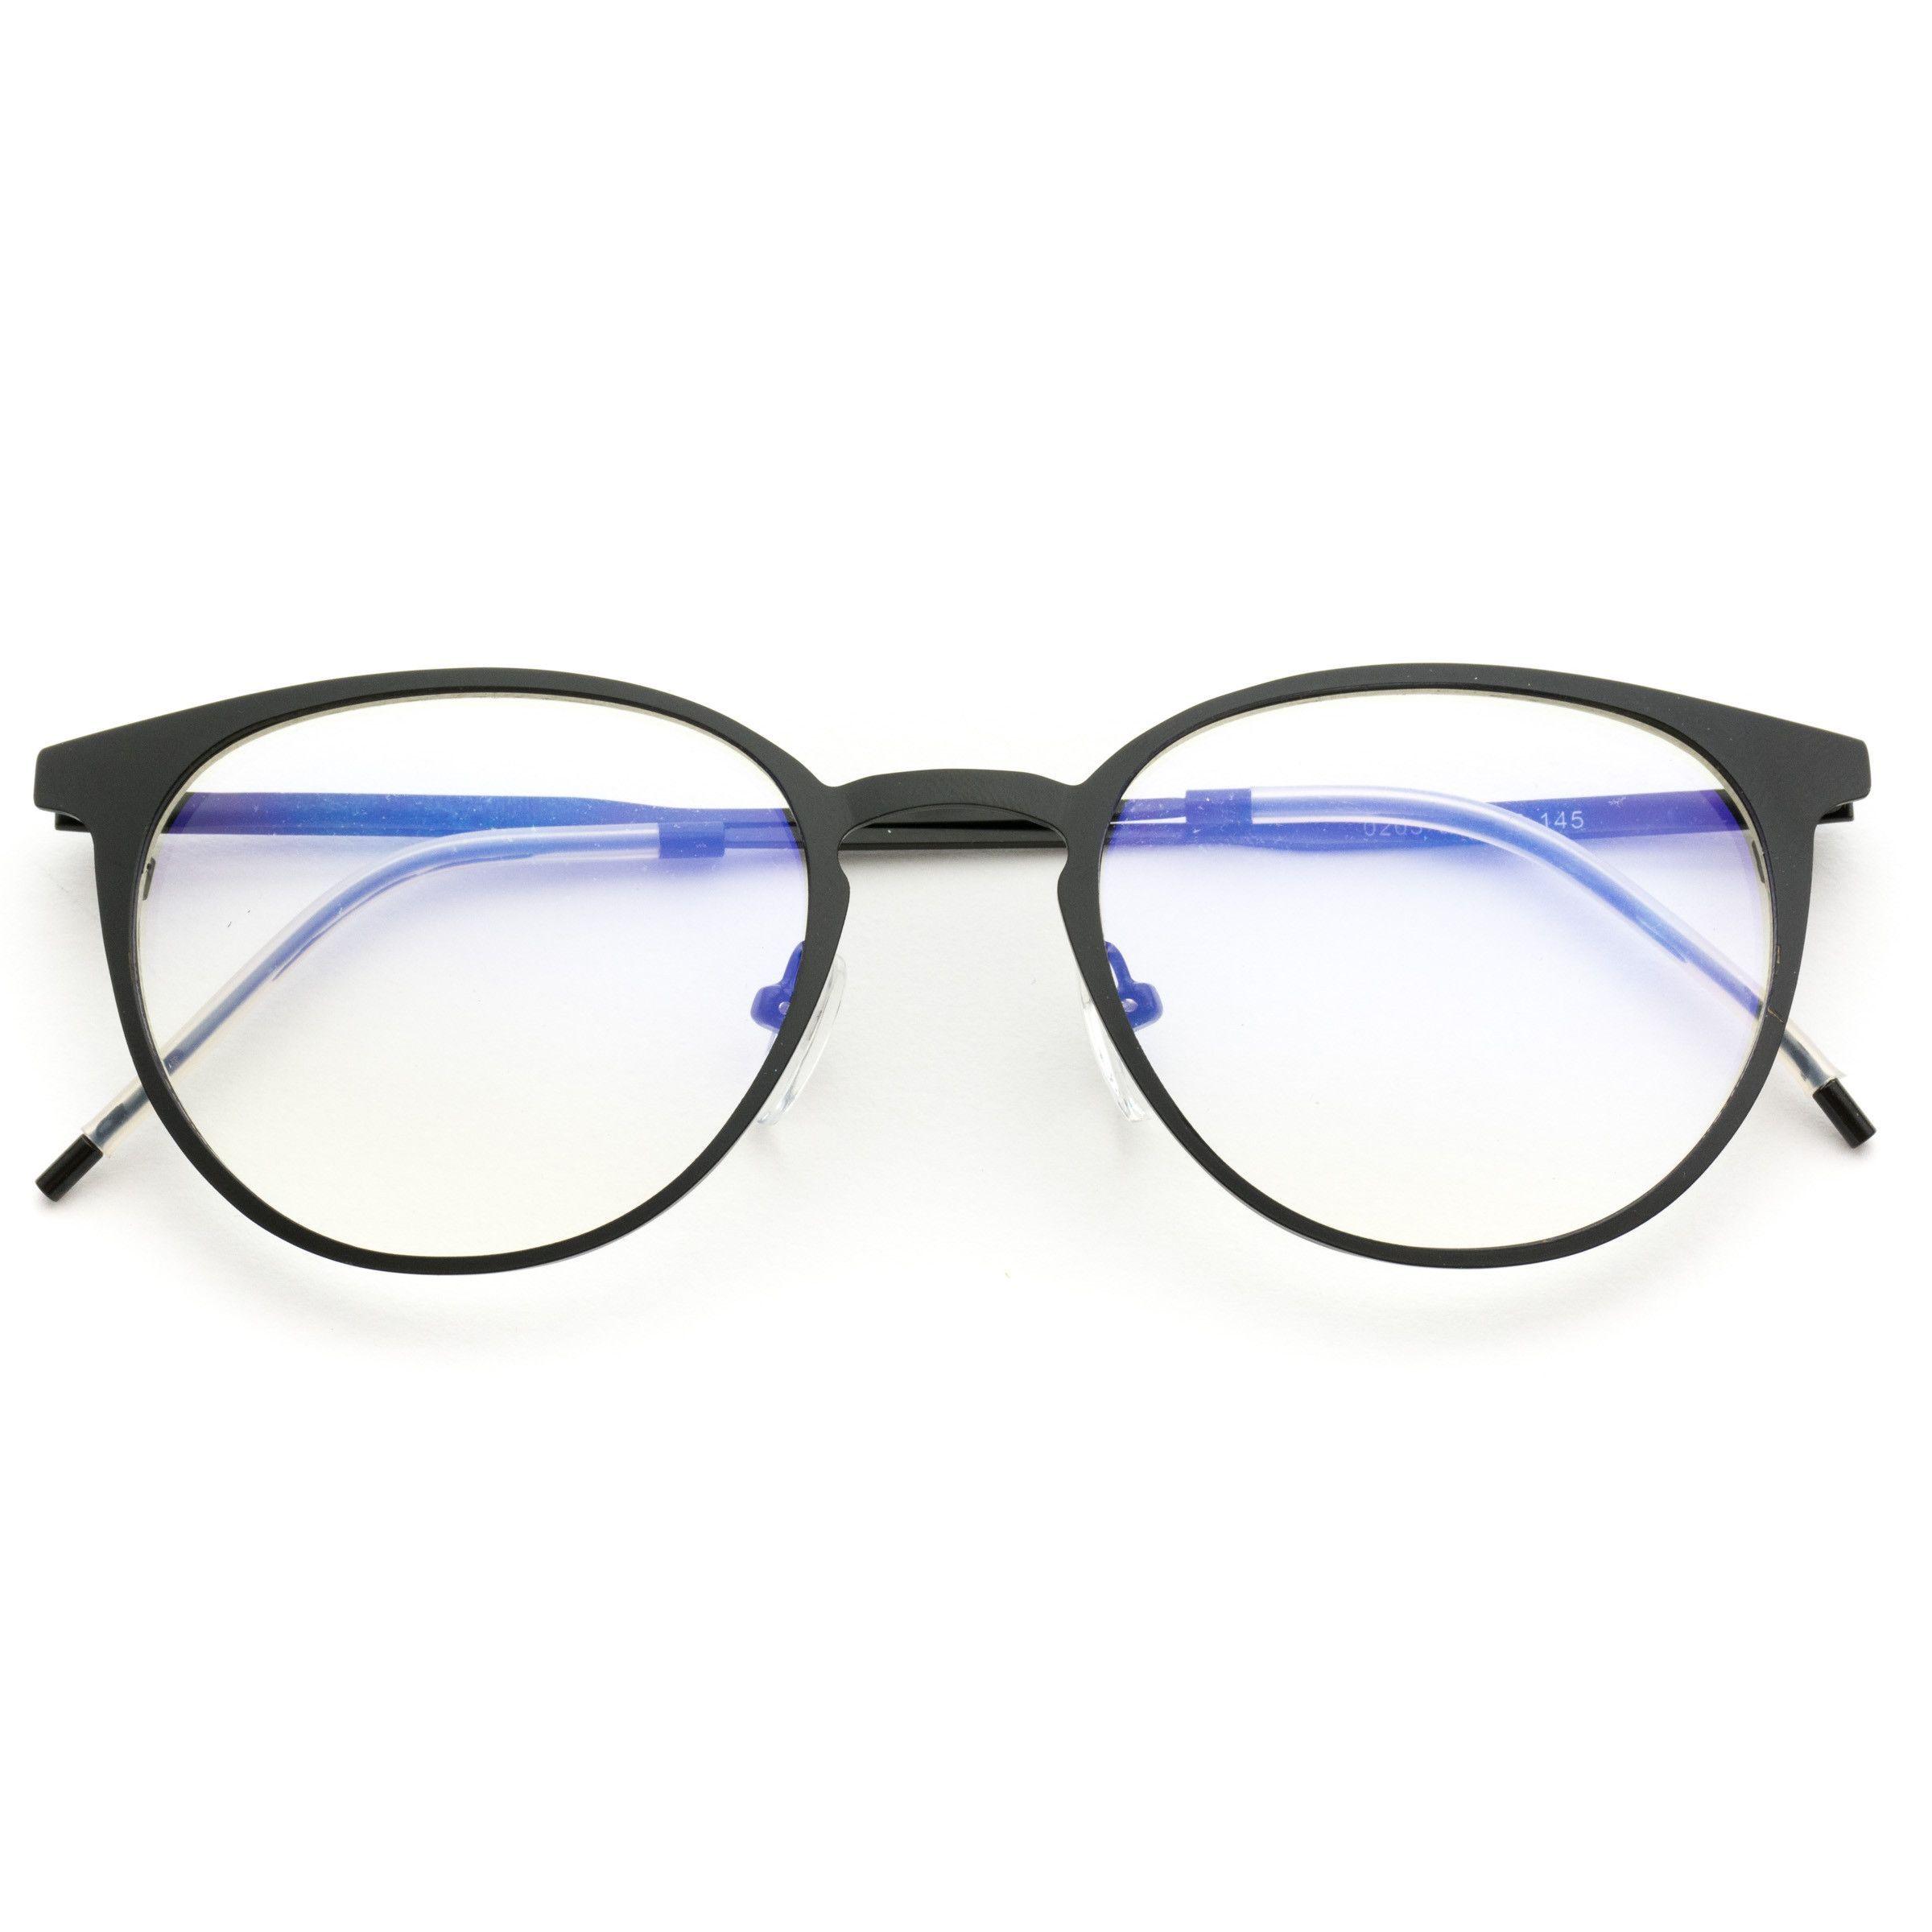 Tom Modern Thin Metal Frame Lightweight Glasses | Toms, Prescription ...